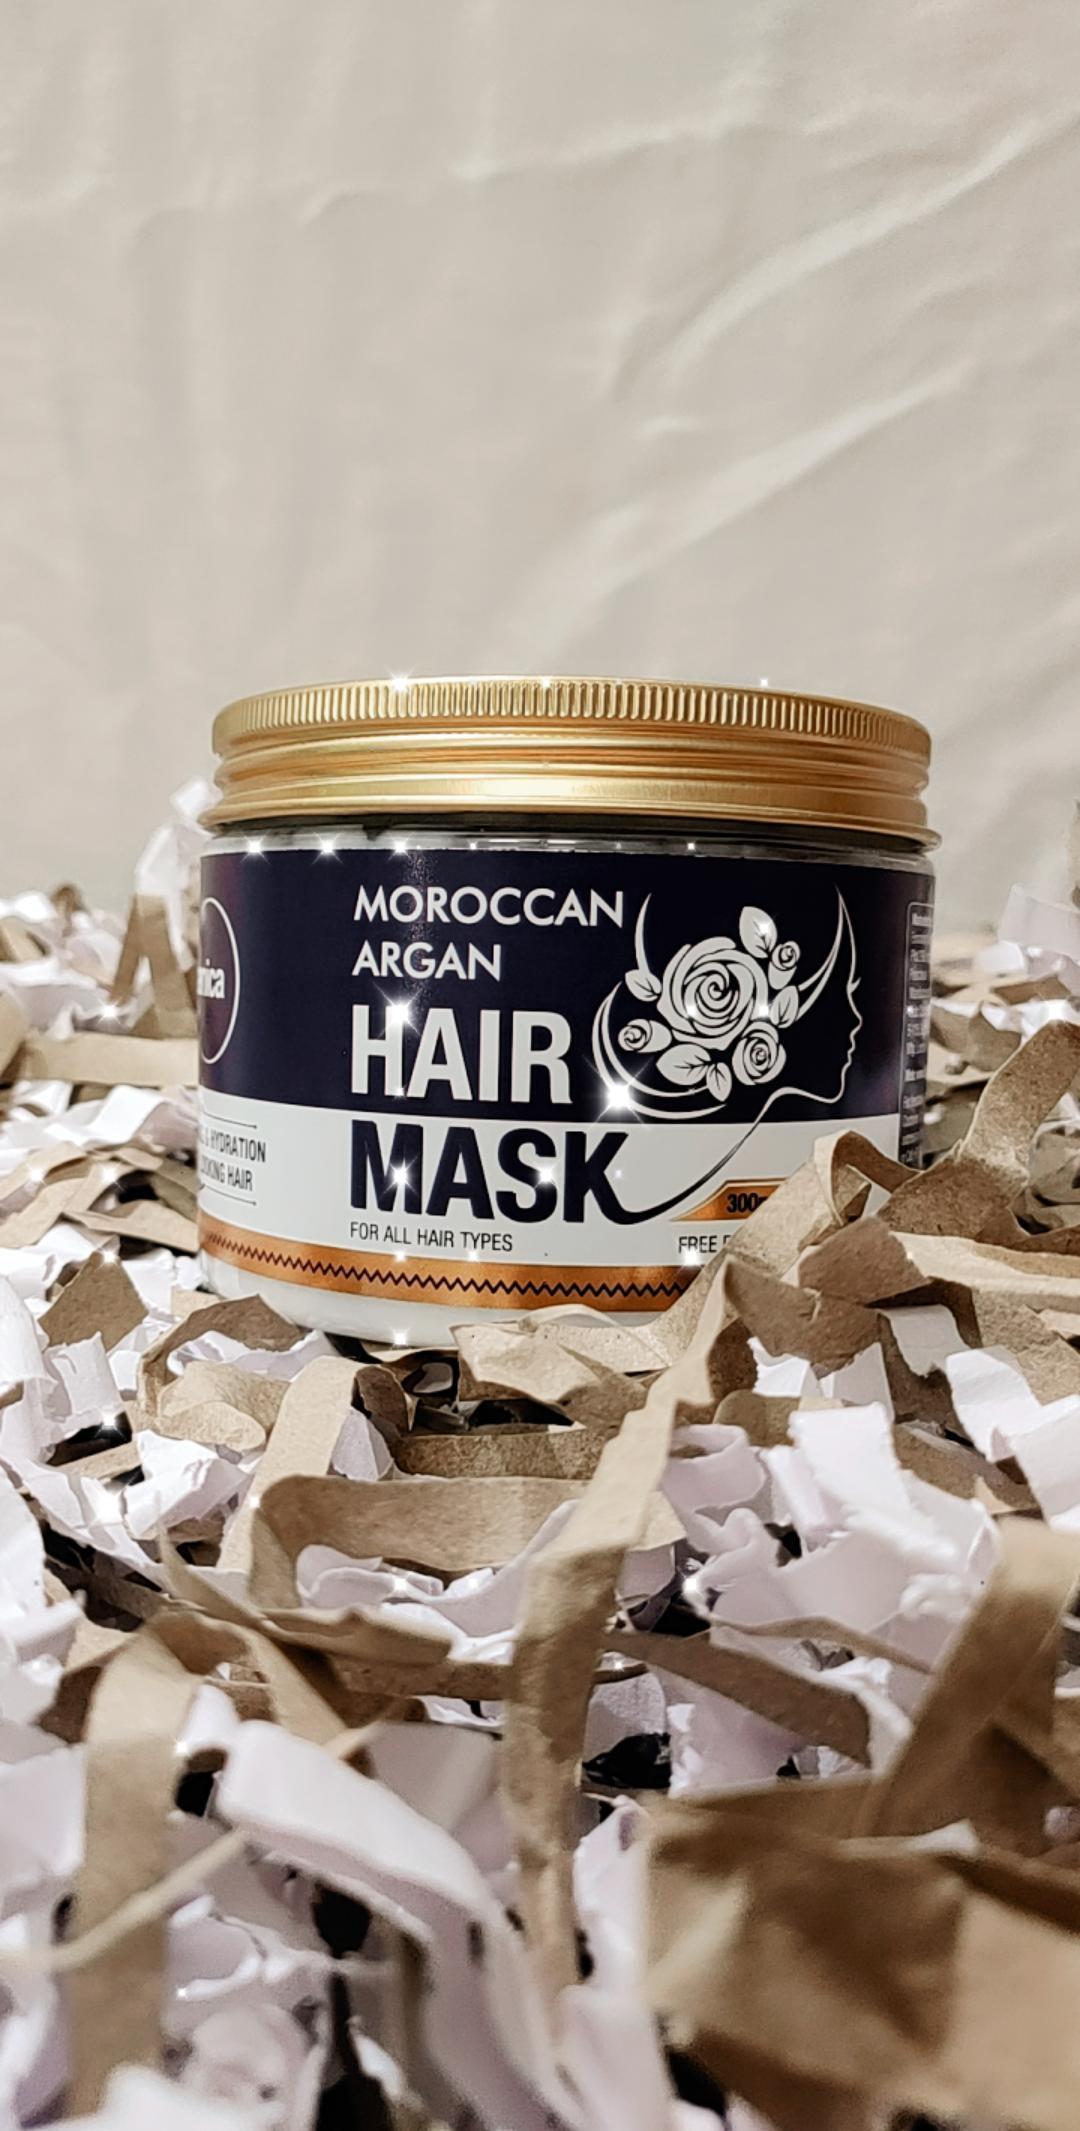 St.Botanica Moroccan Argan Hair Mask-Hair mask-By taniyawarke-1